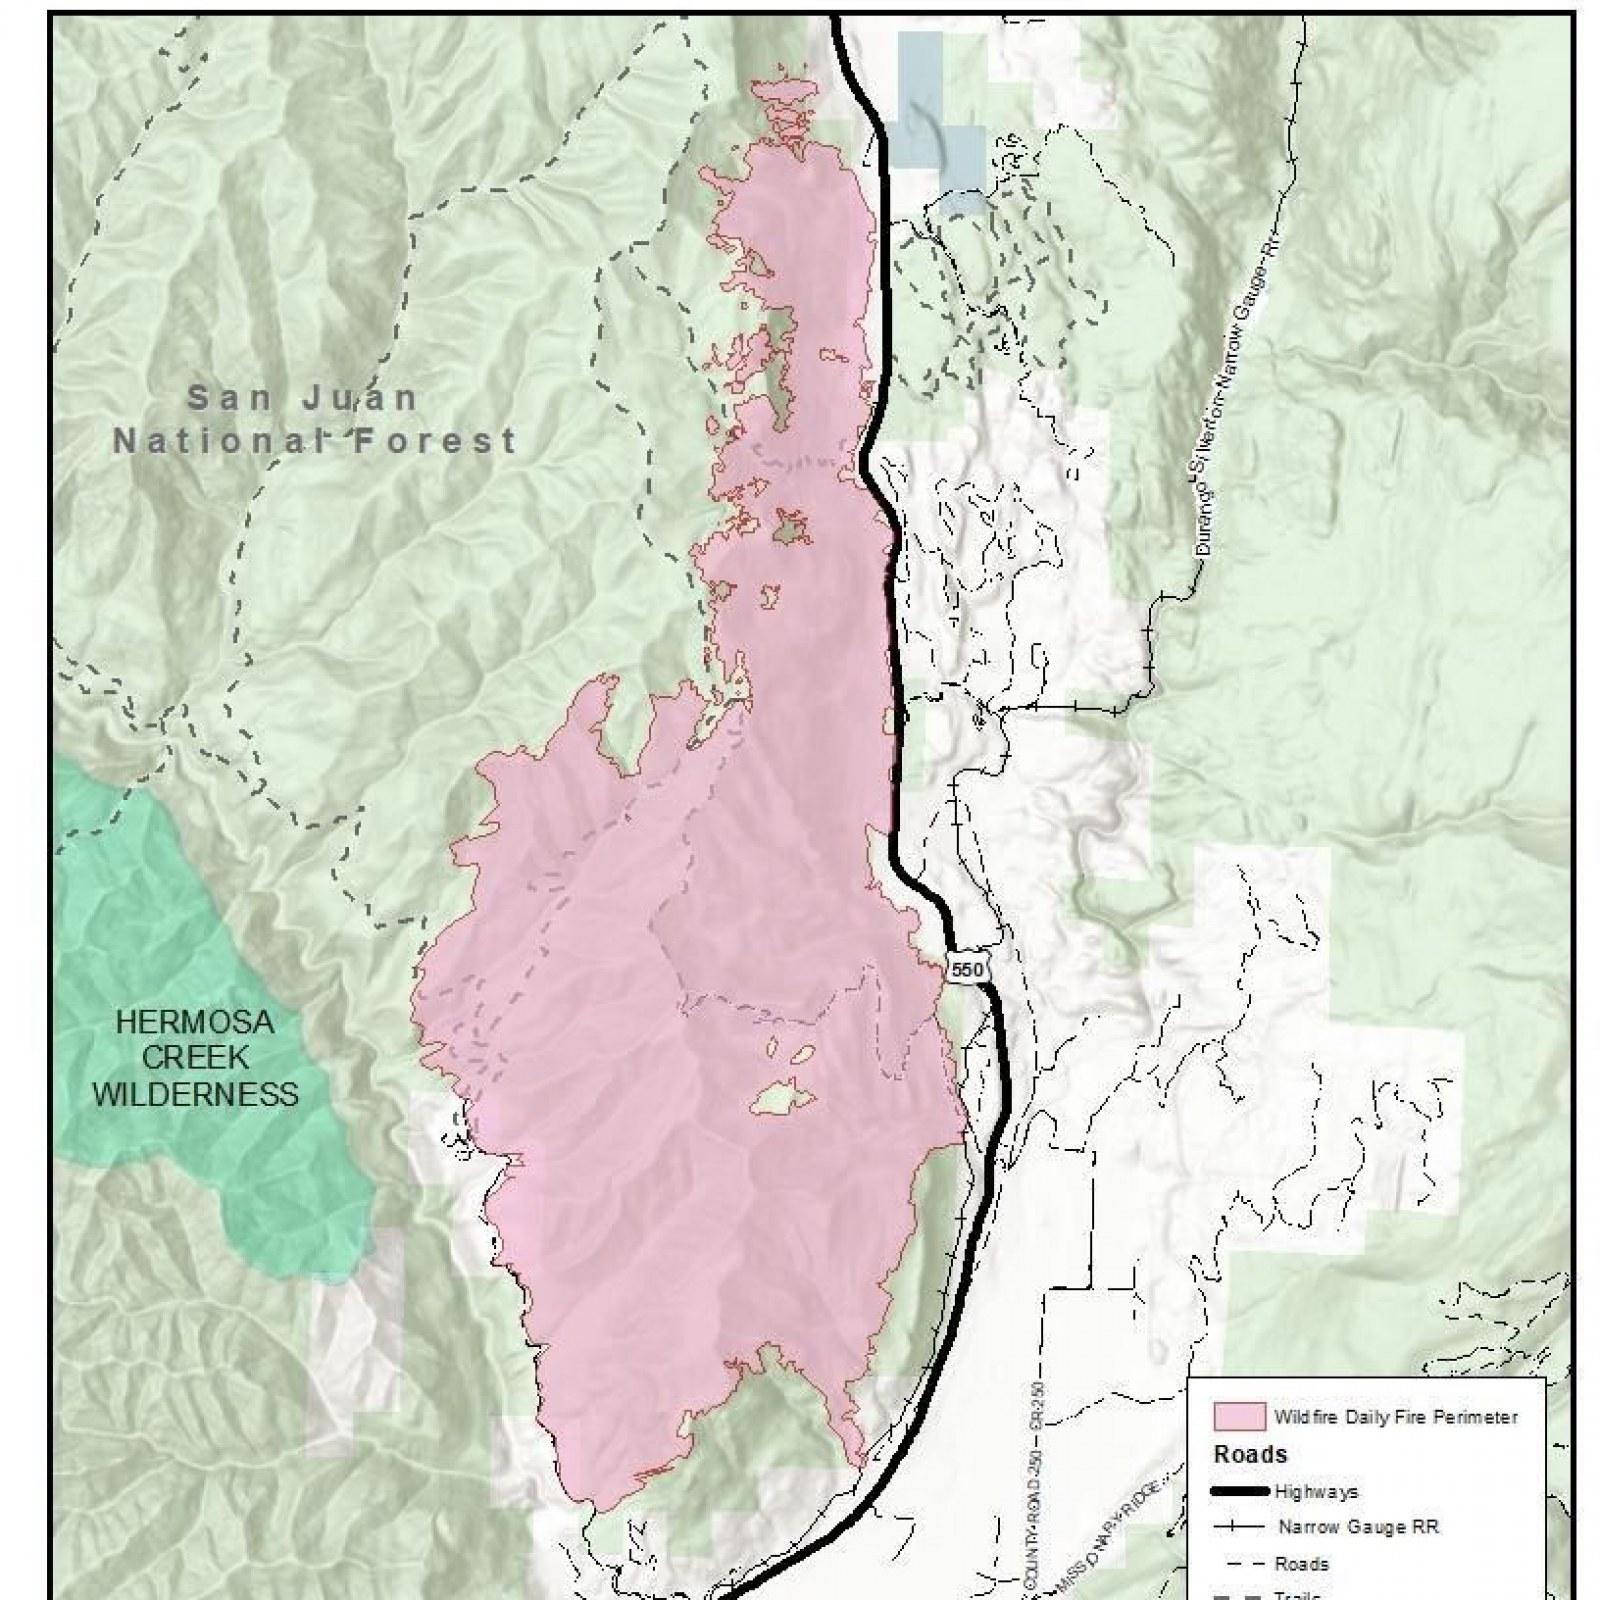 Colorado 416 Fire Map Update: Durango Fire Grows 40 Percent